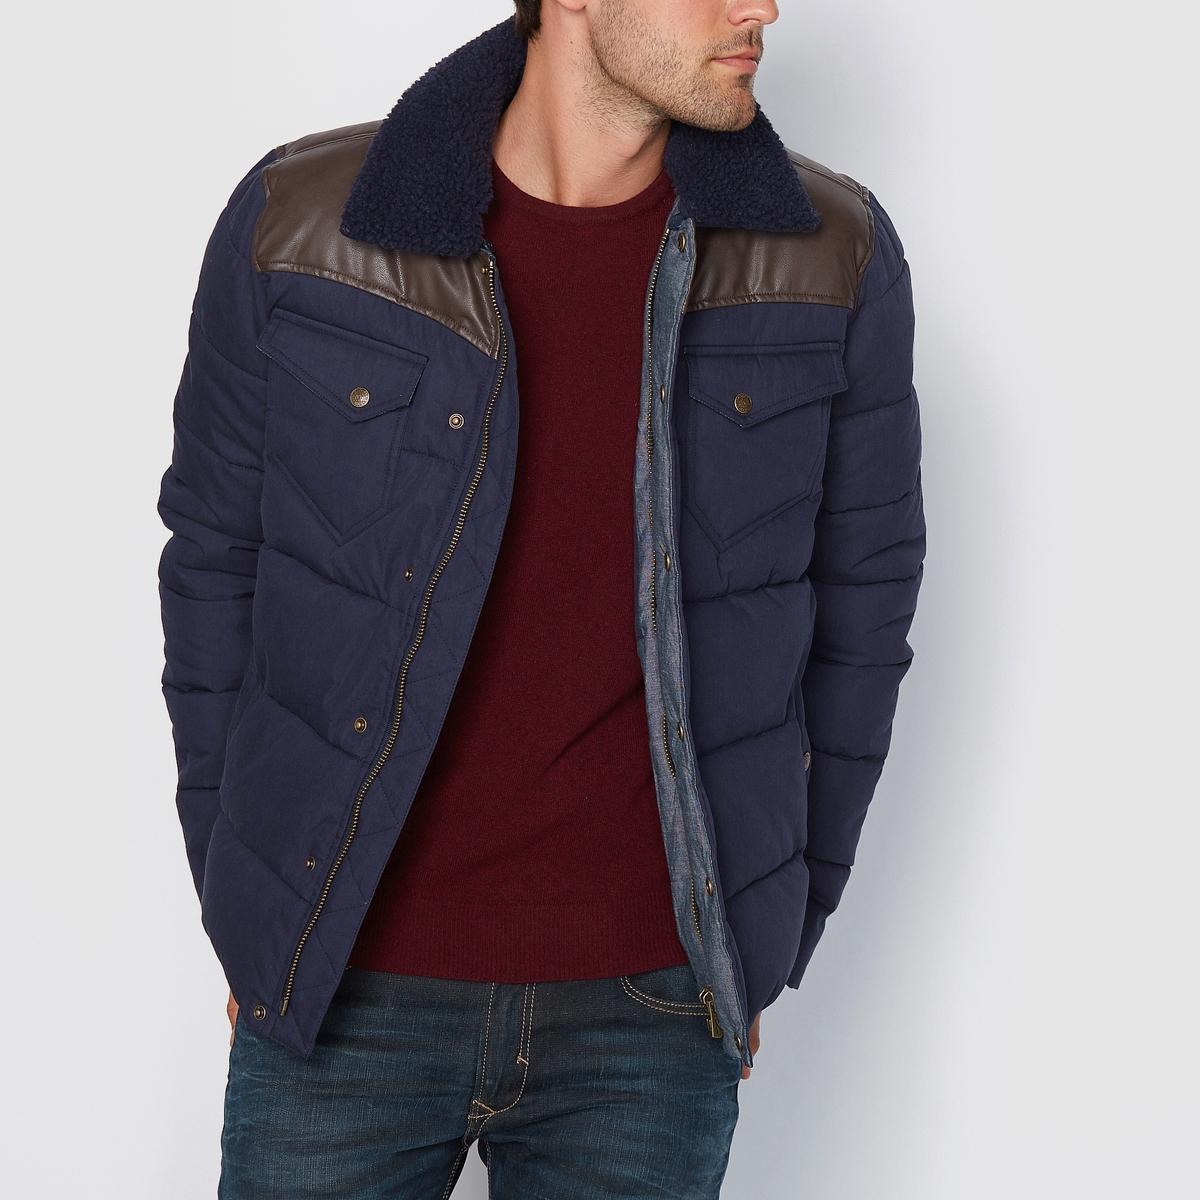 Стёгная куртка Booky